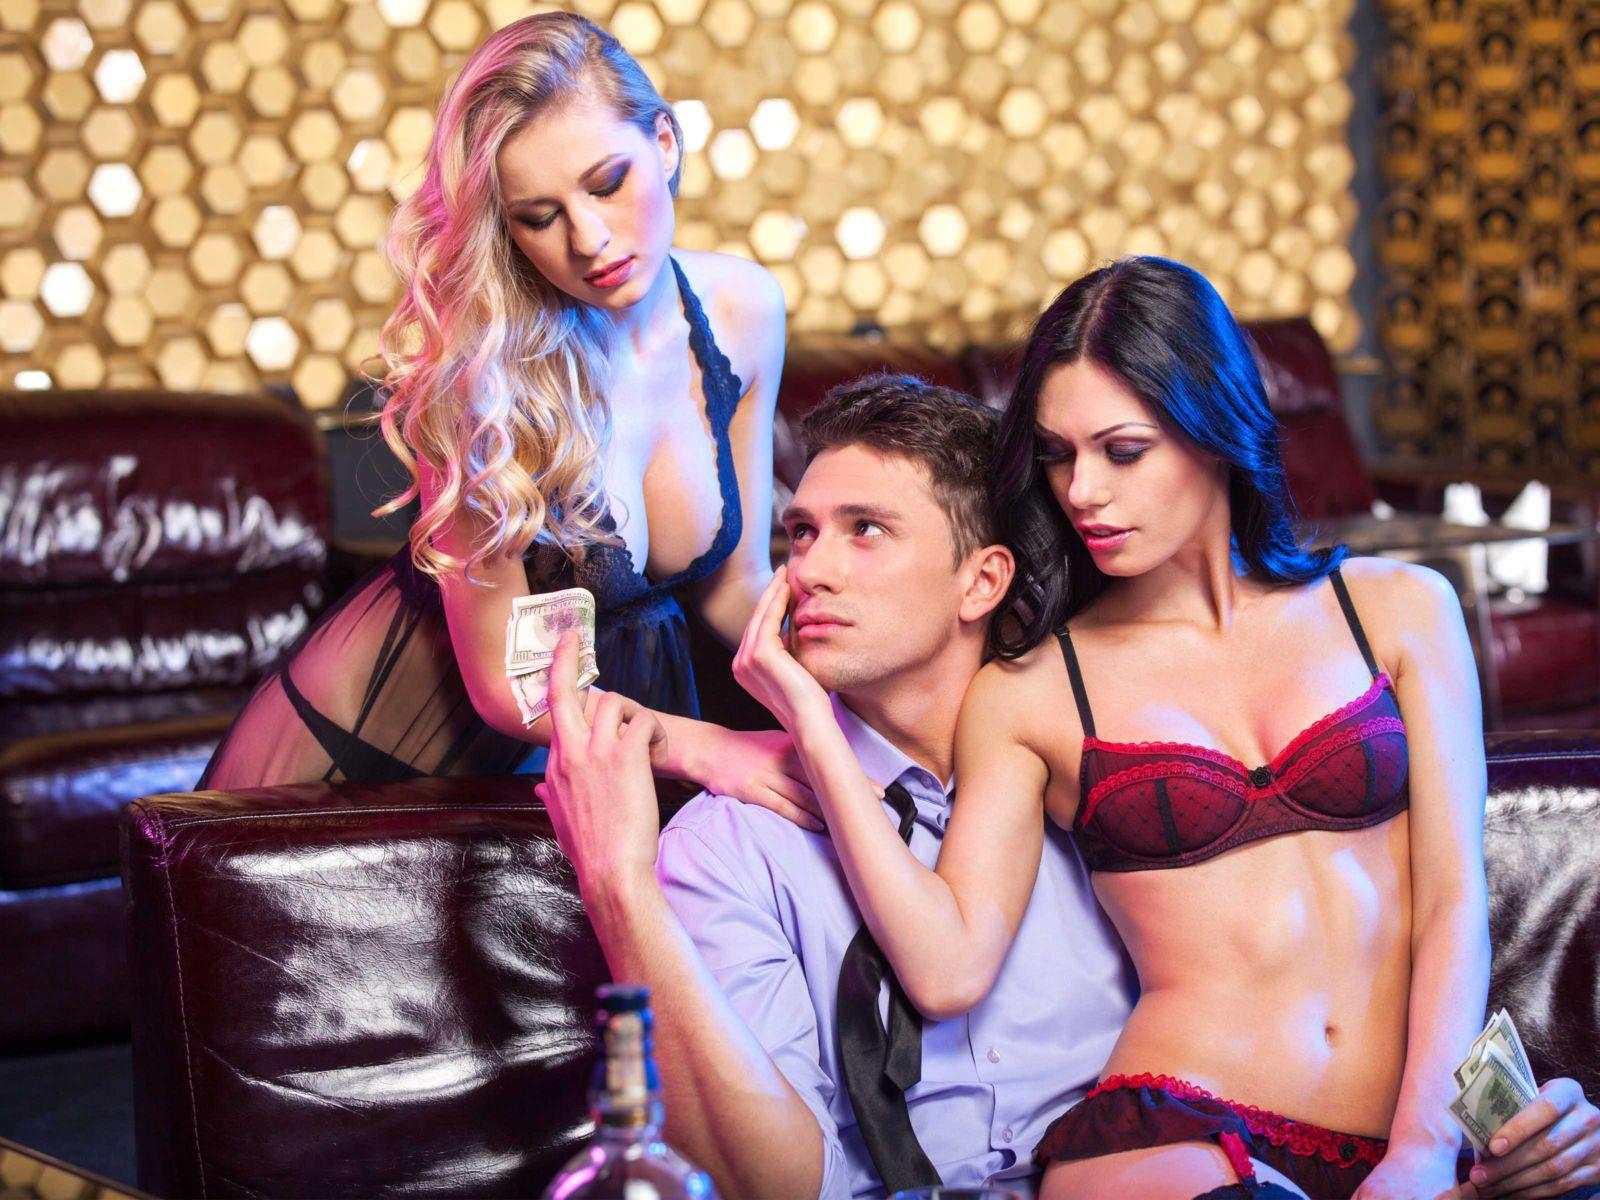 Private Strip / Lap Dance Show